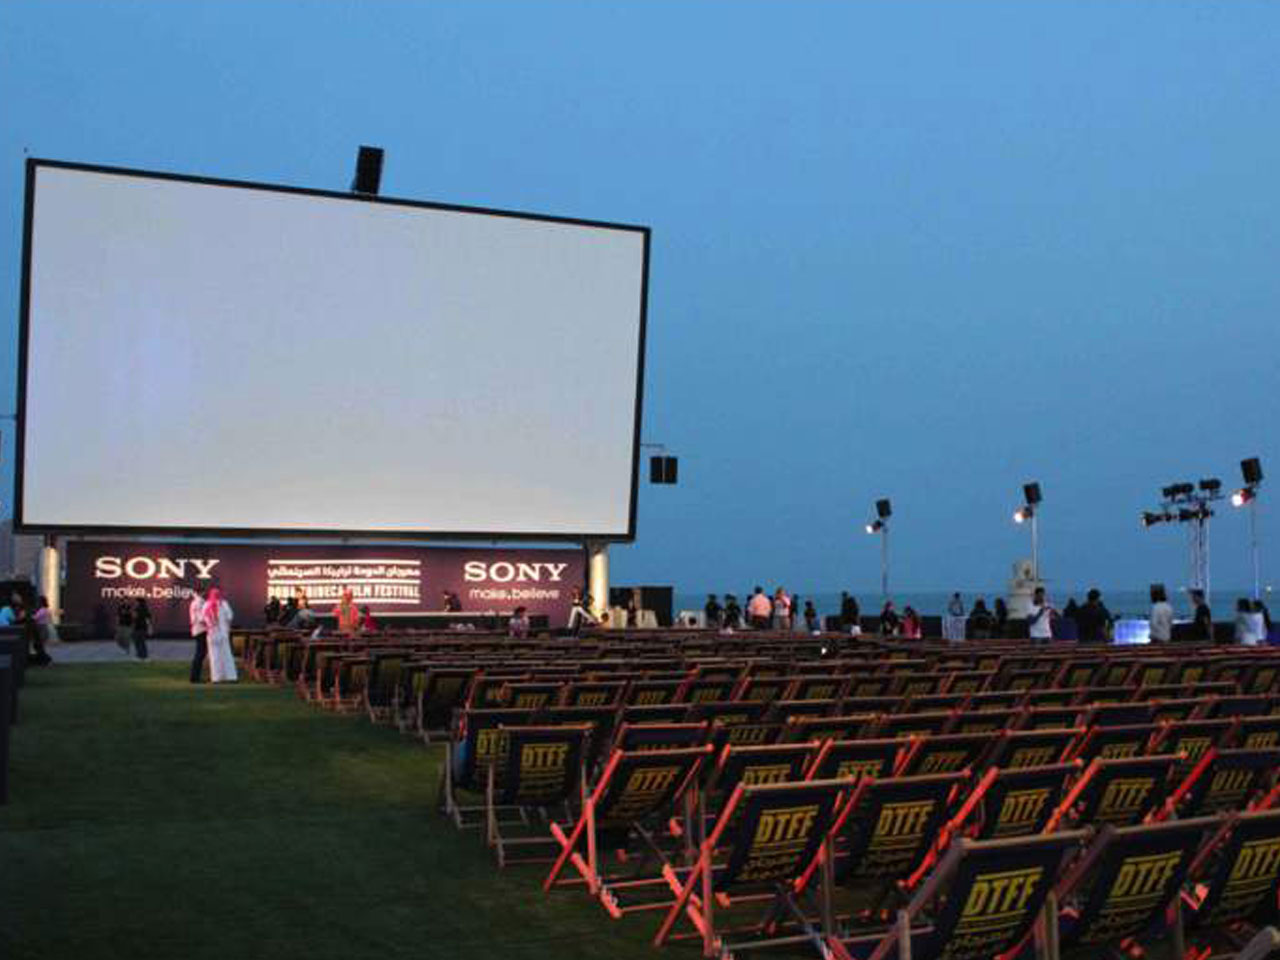 grandstand-seats-events-setup-rental-stadium-seating-sport-management-film-festival-seating-screening-f1-open-air-cinema-35